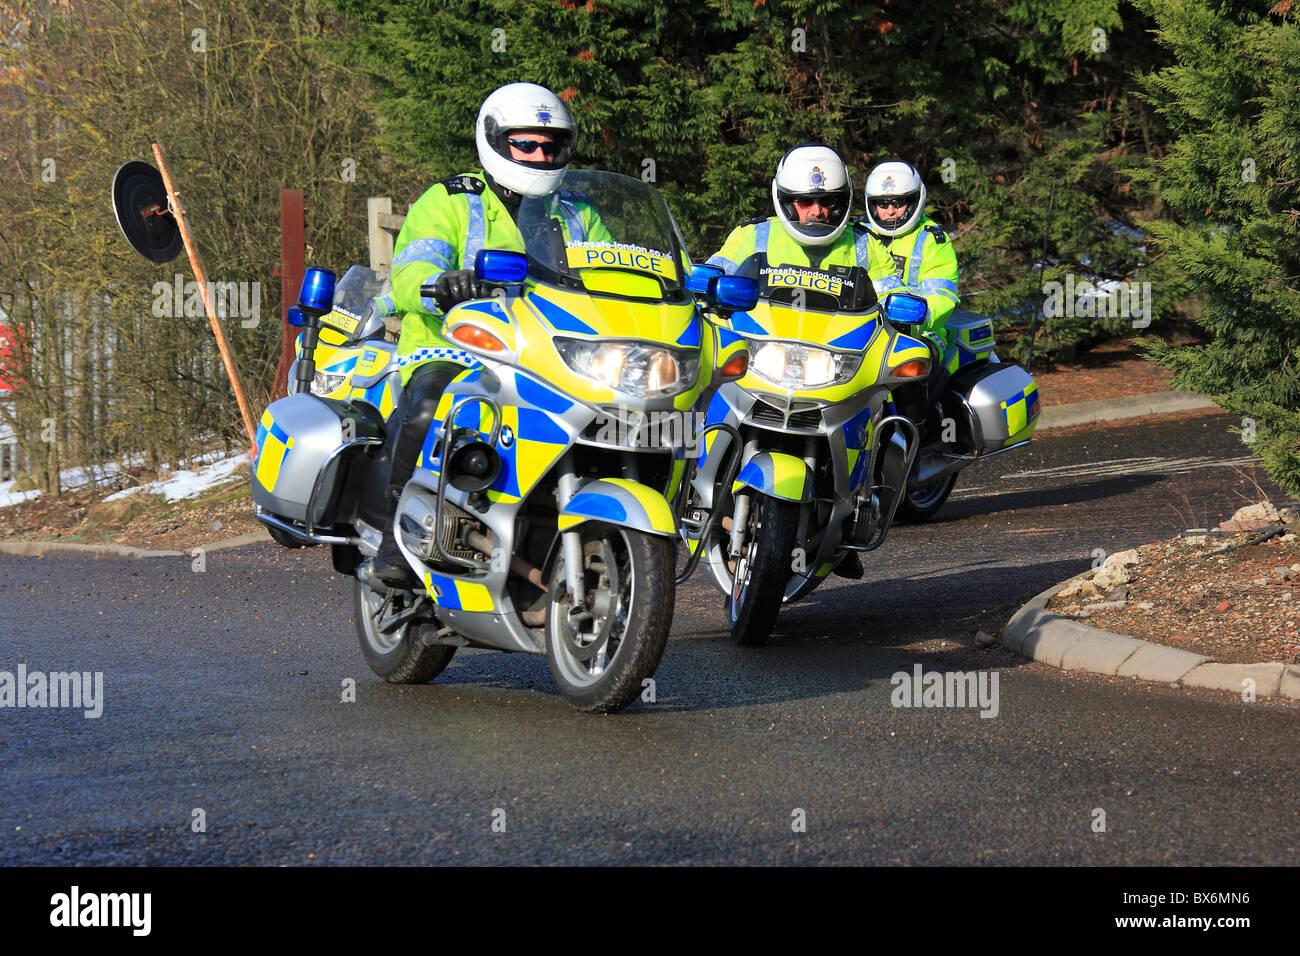 Motos policiales Imagen De Stock